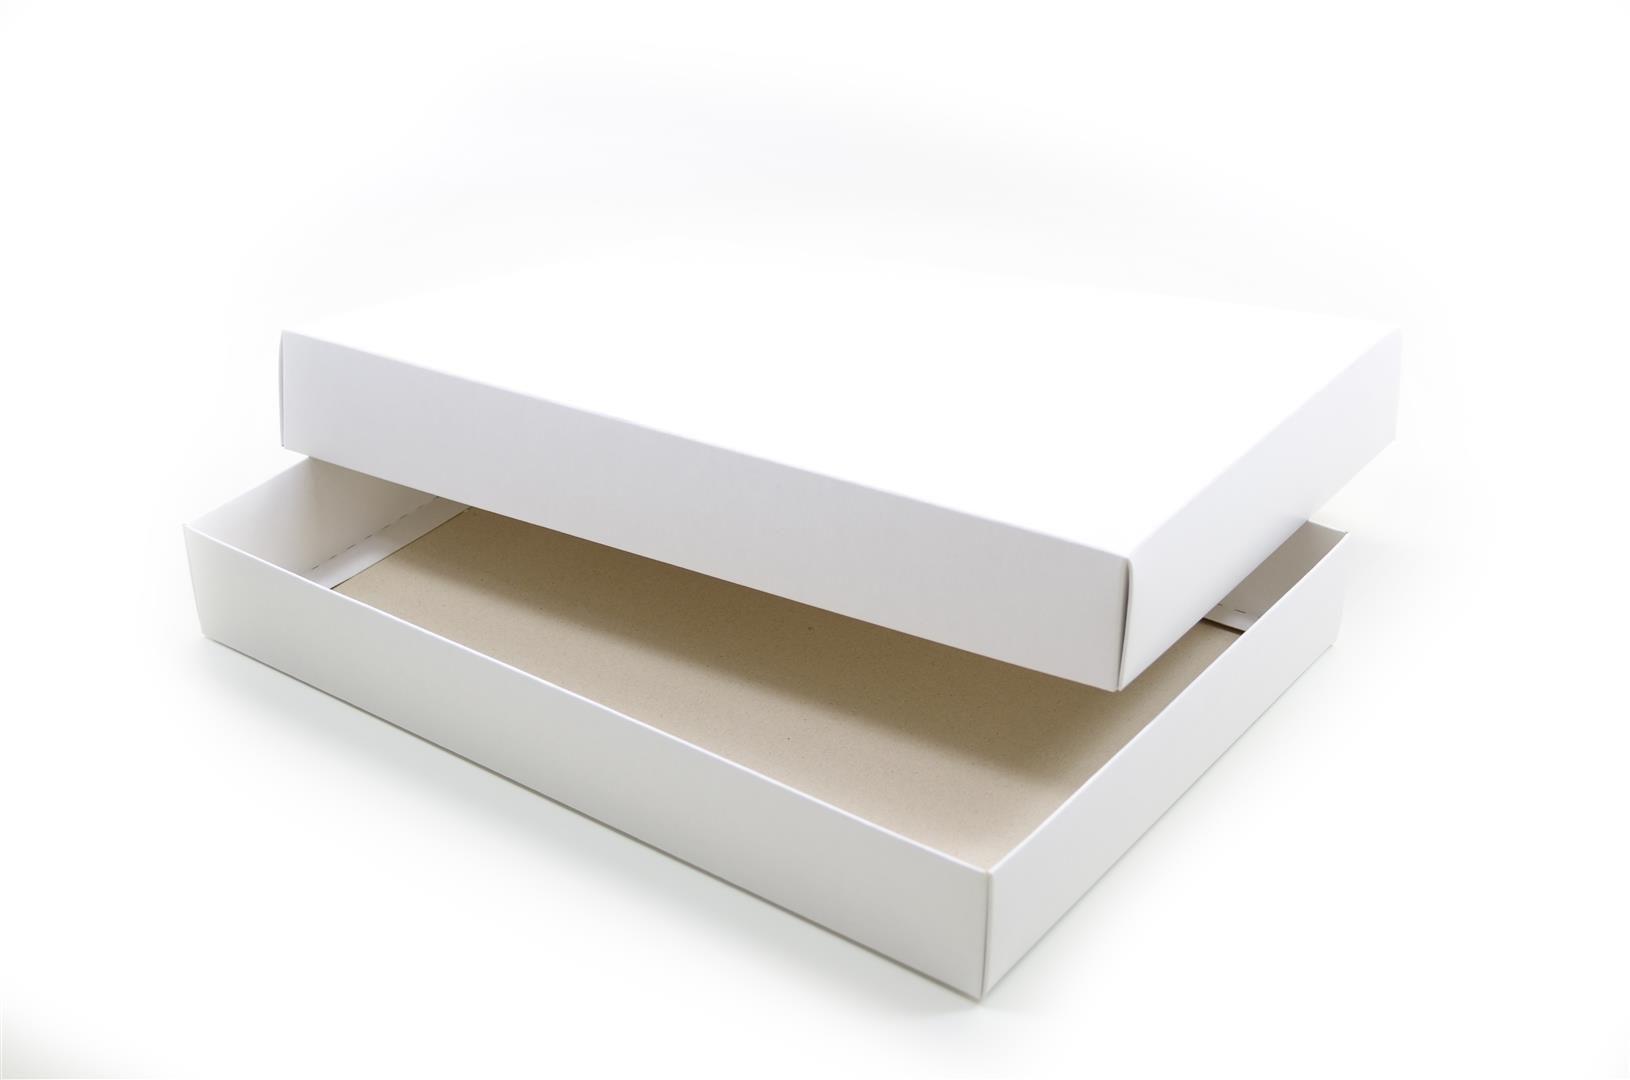 Ref 039 Branca - Caixa c/ tampa papel - 36x25,5x5 cm - c/ 10 unidades